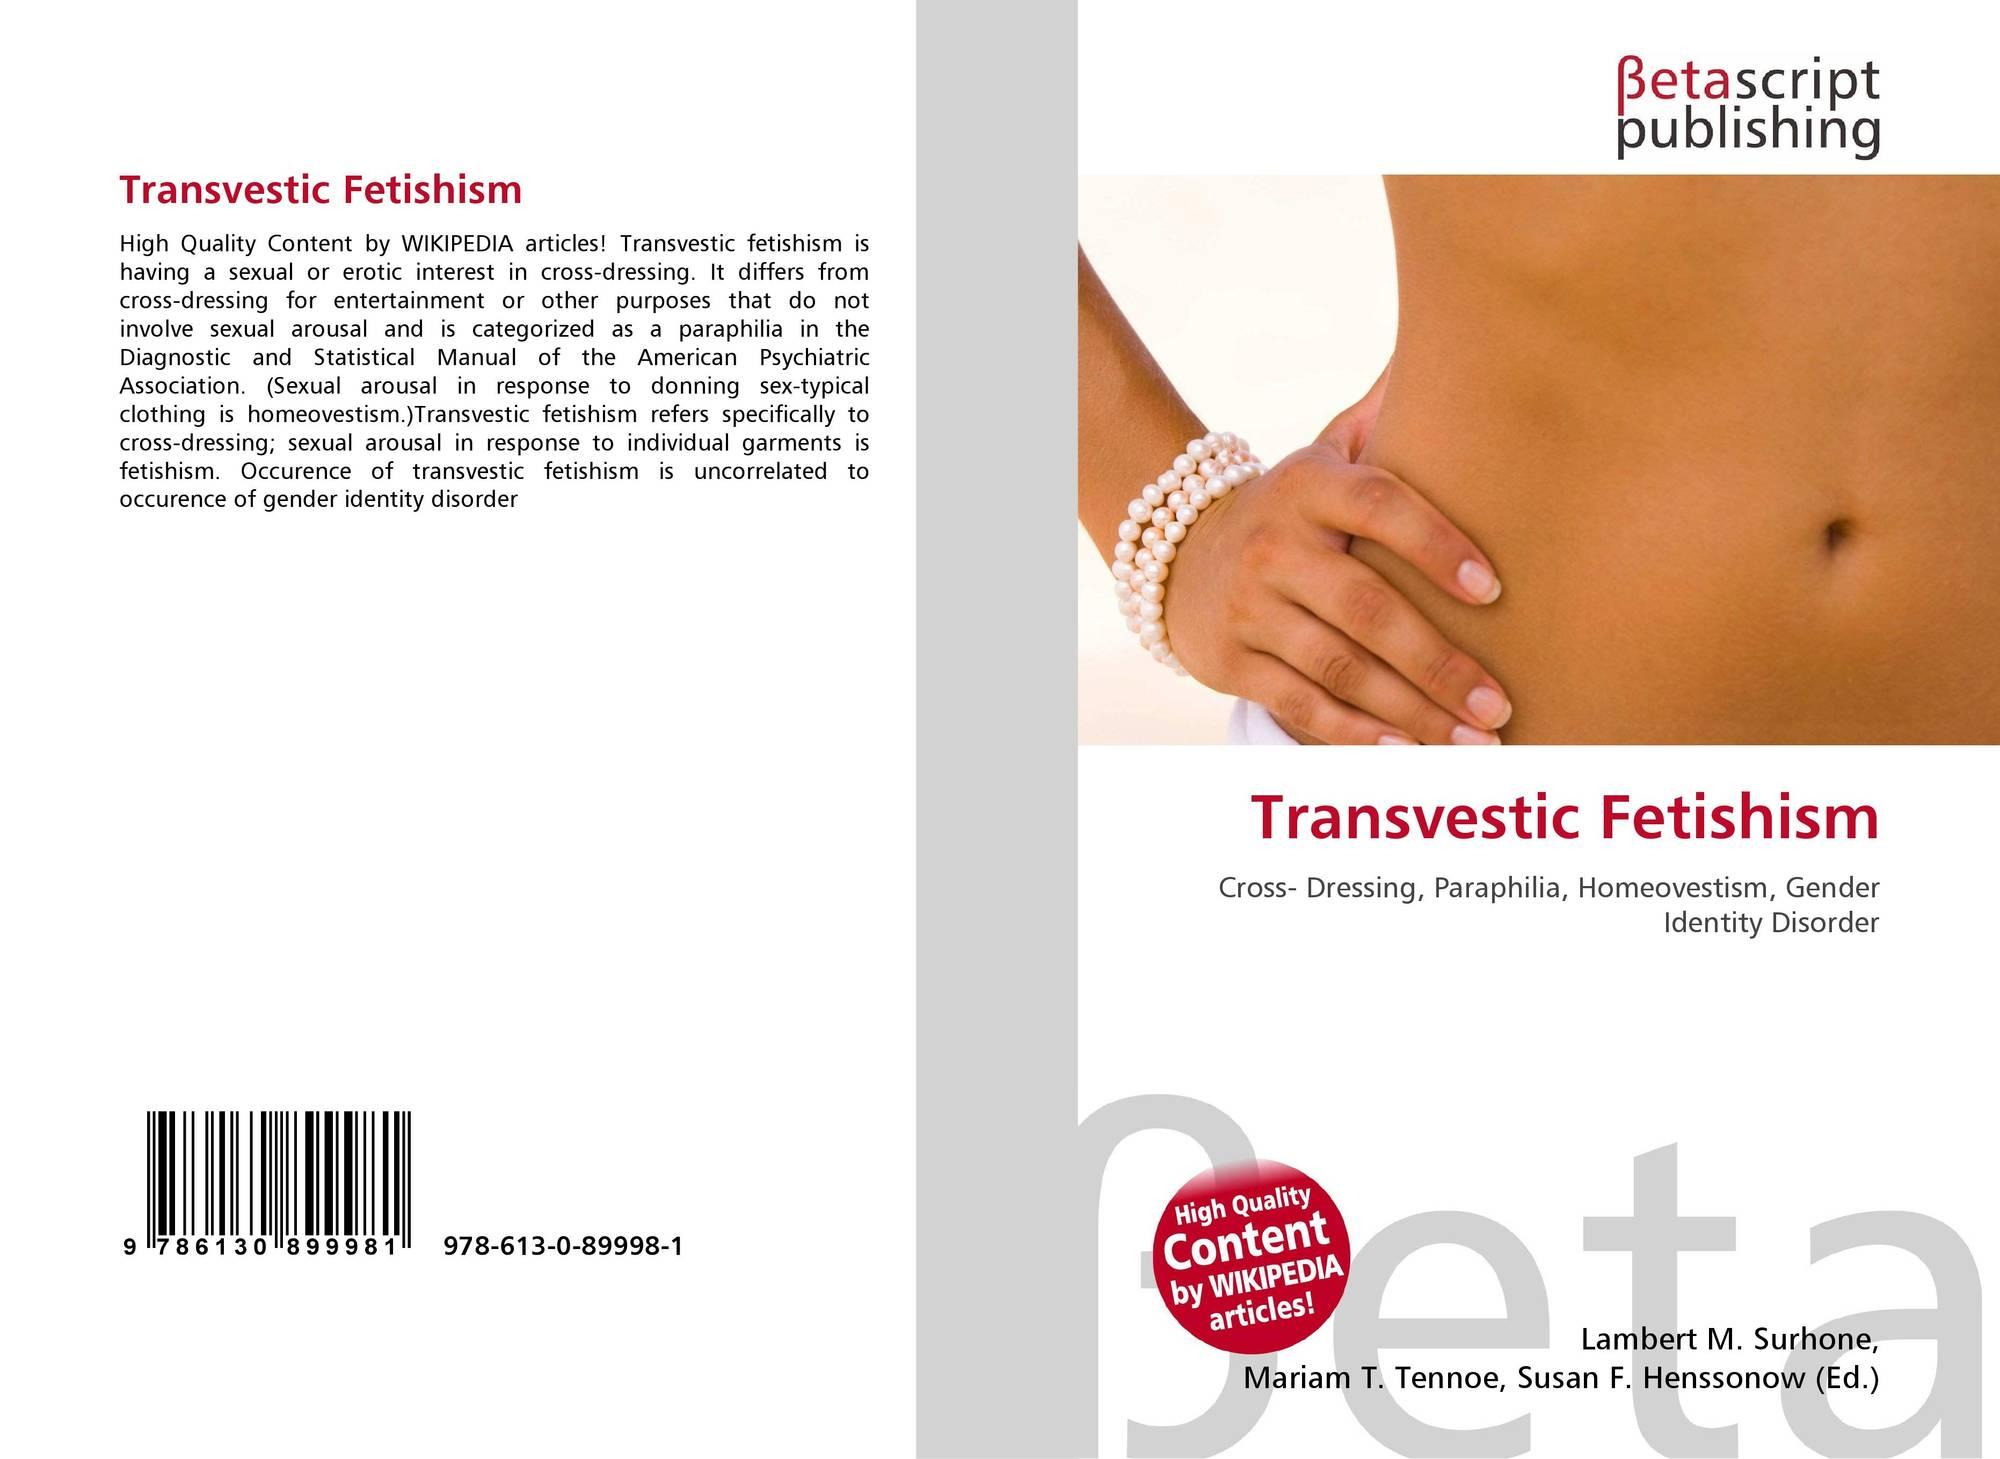 fetishism a paraphilia essay